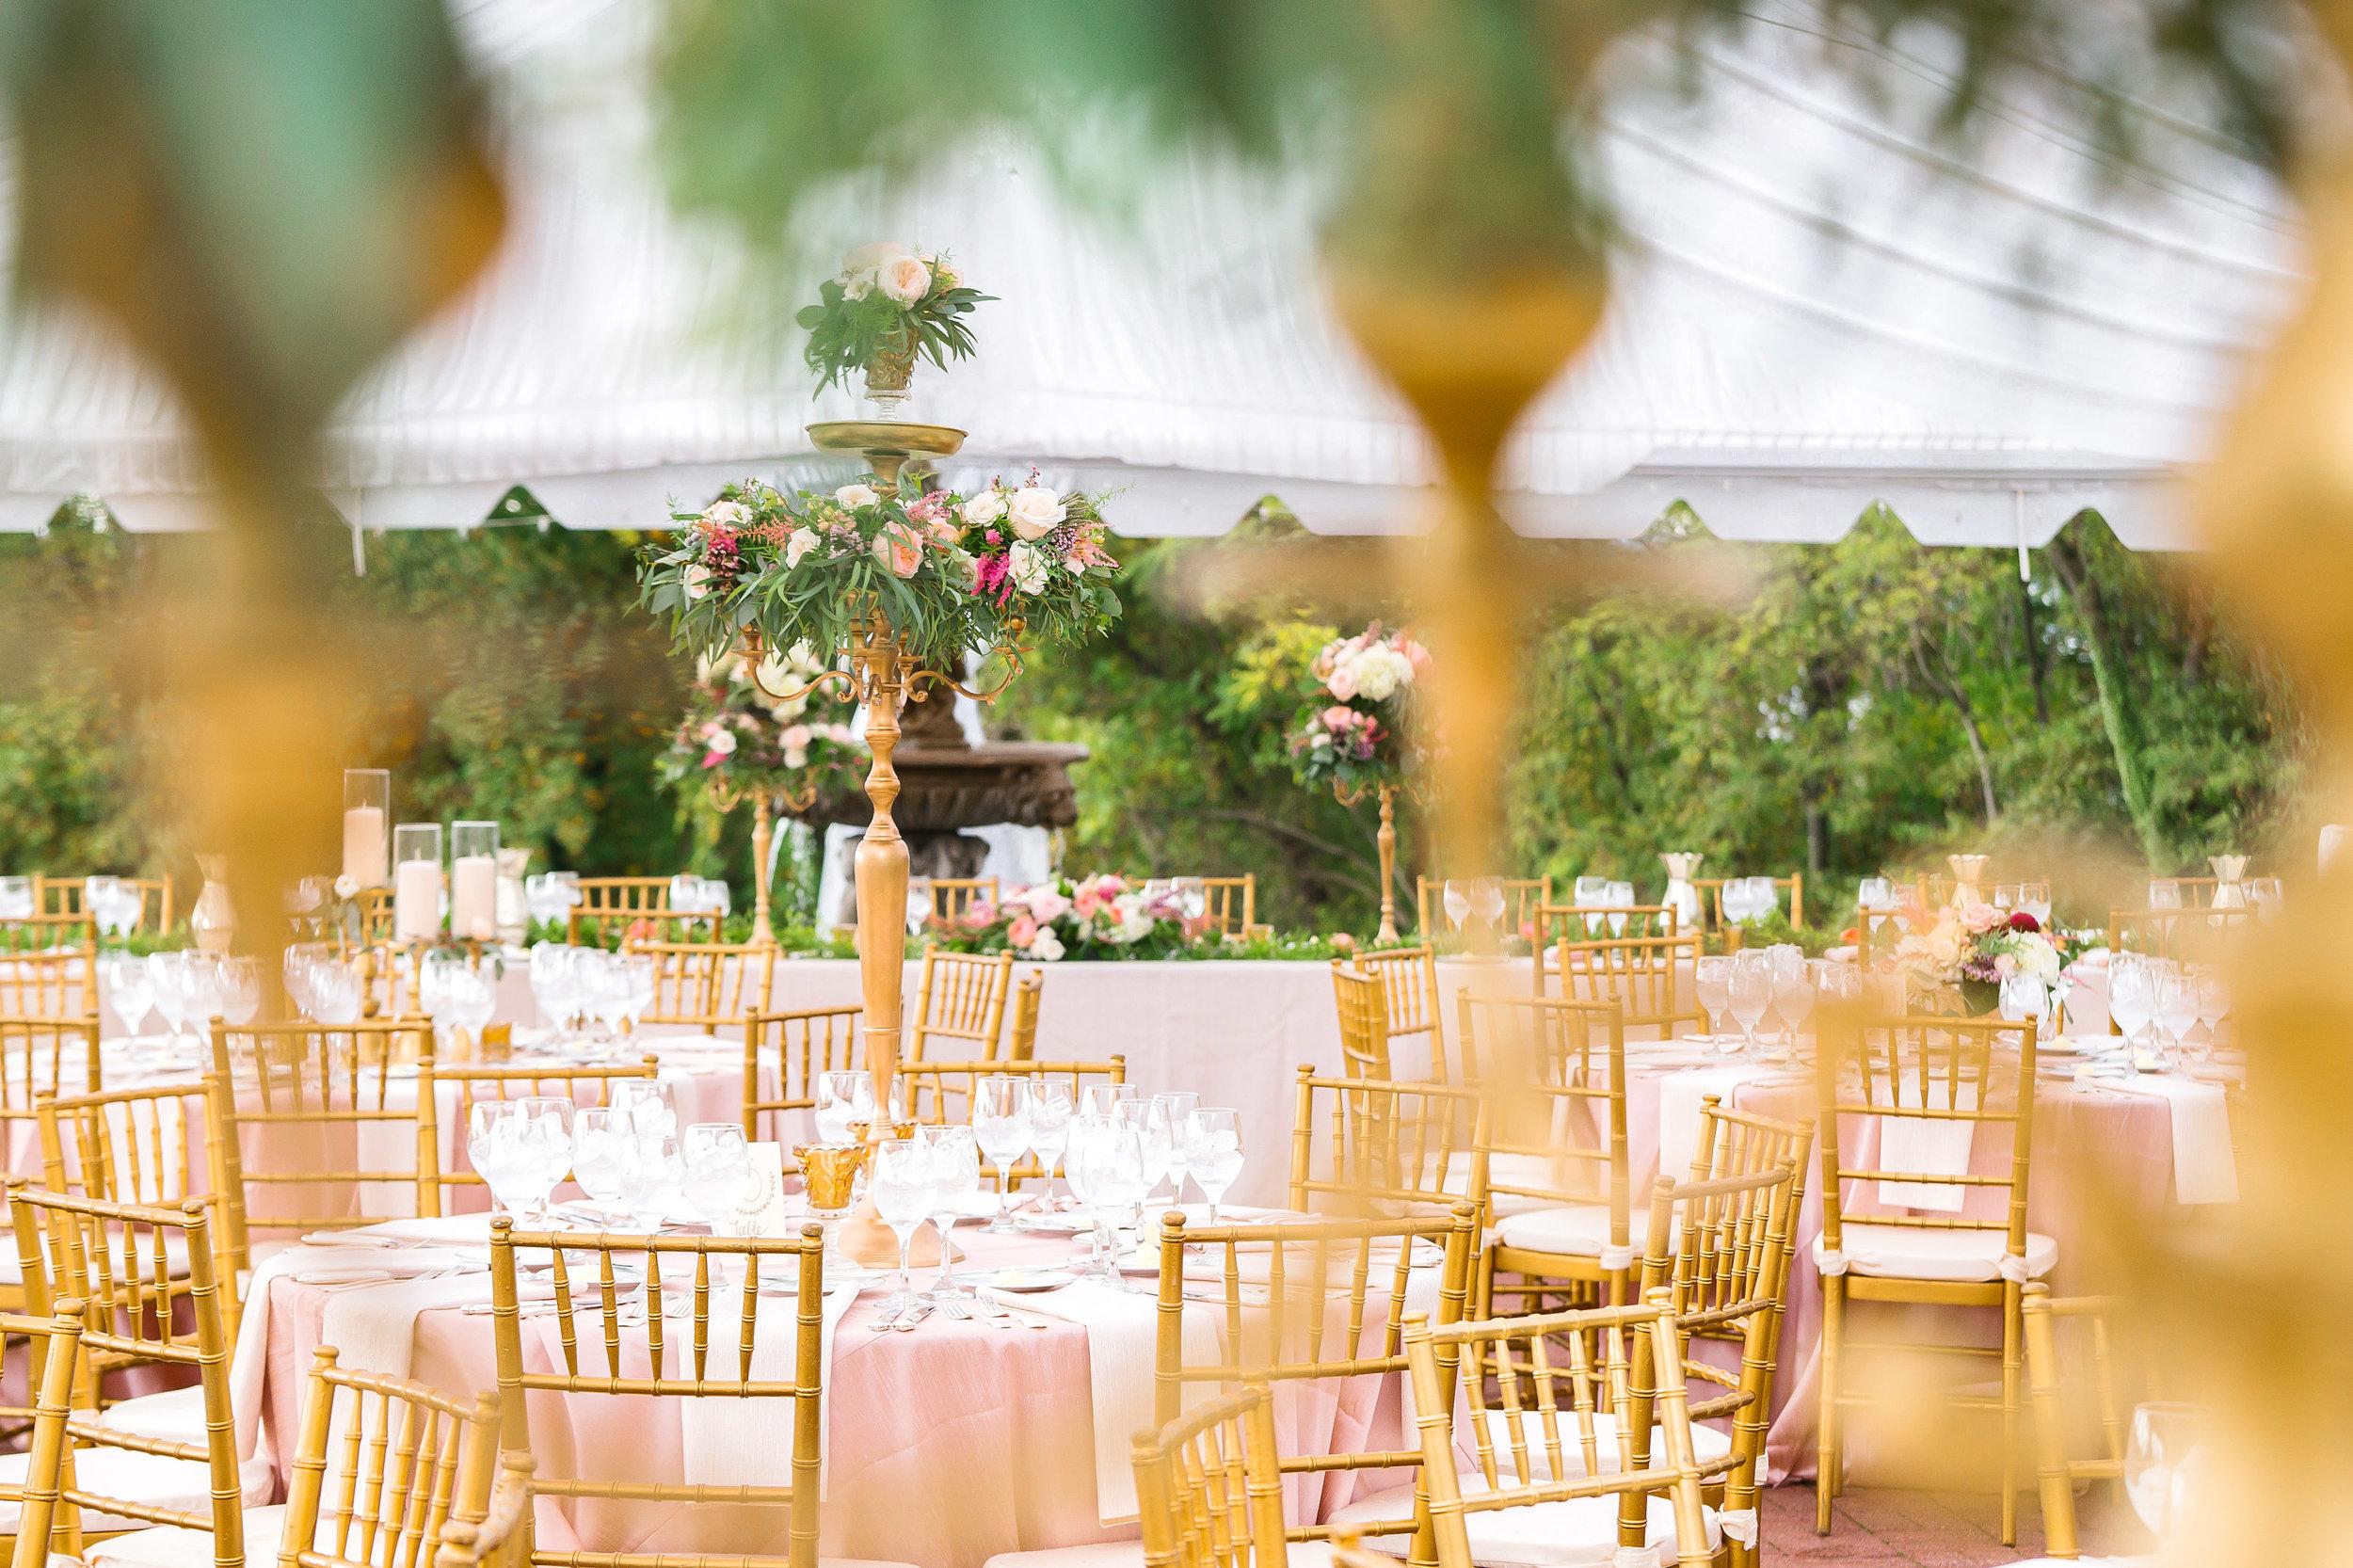 Wedding reception photos at Oxon Hill Manor by jessica nazarova